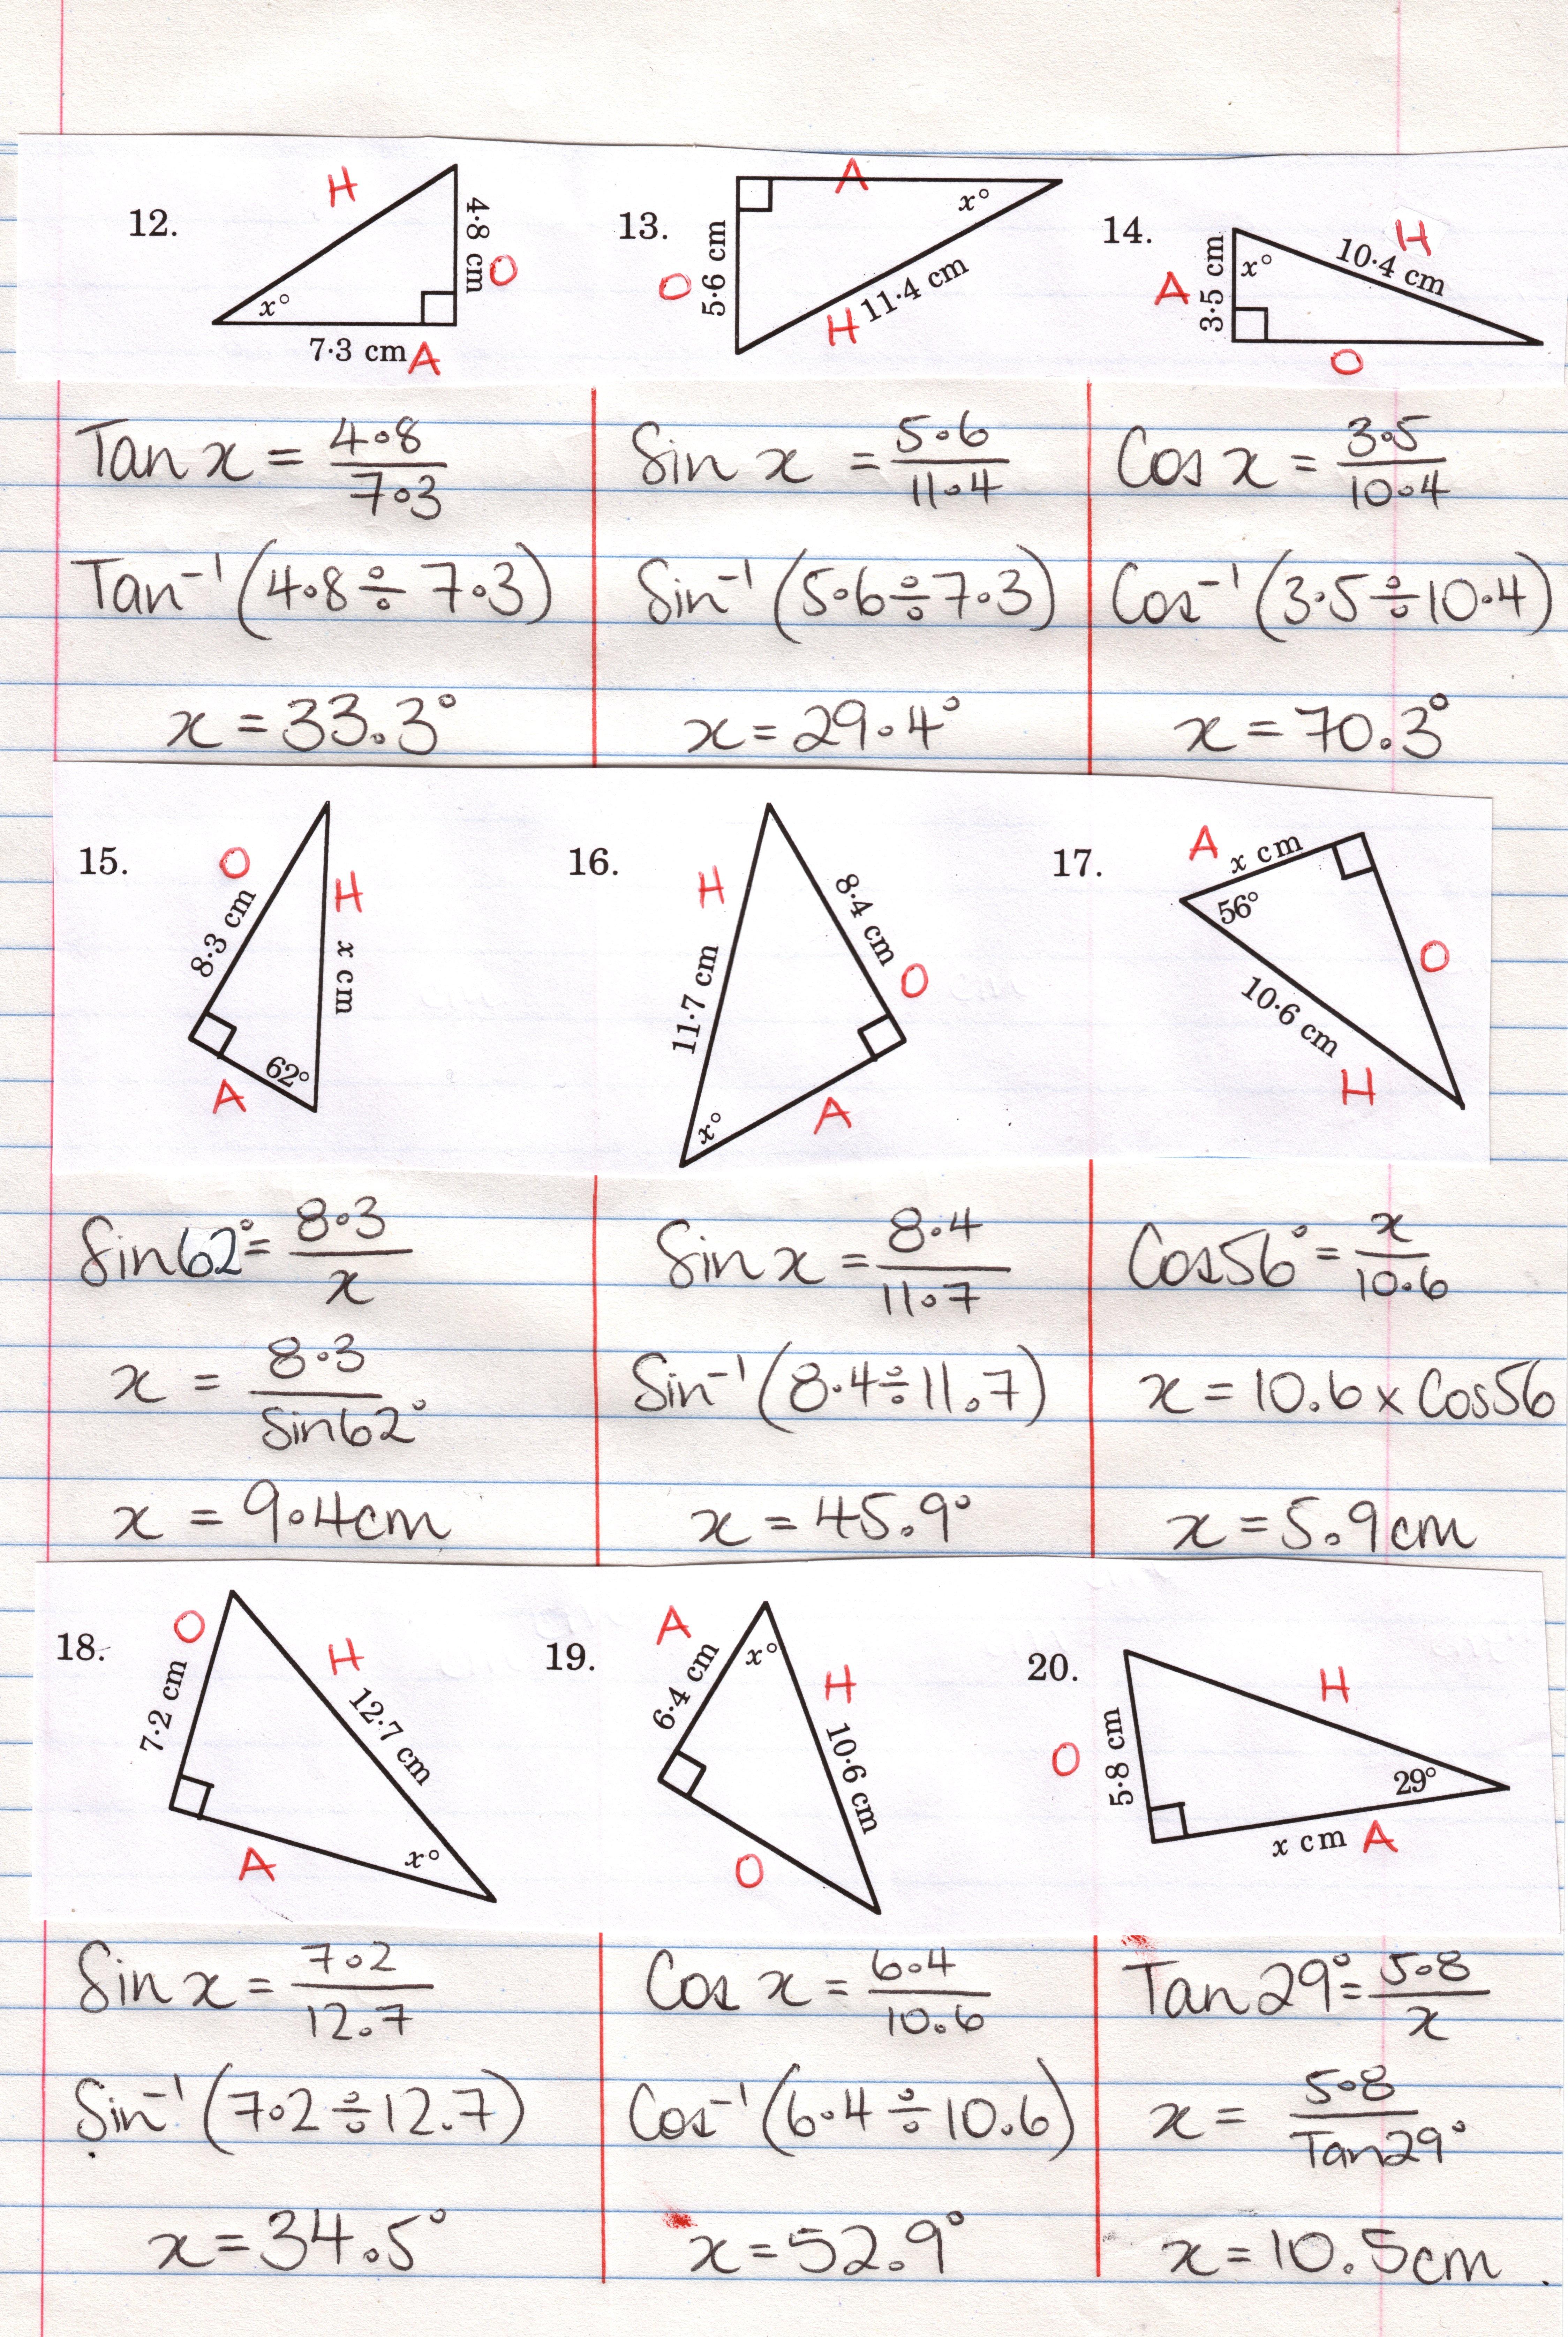 Printables Trigonometry Worksheets With Answers Lemonlilyfestival Within Trigonometric Ratios Worksheet Answers